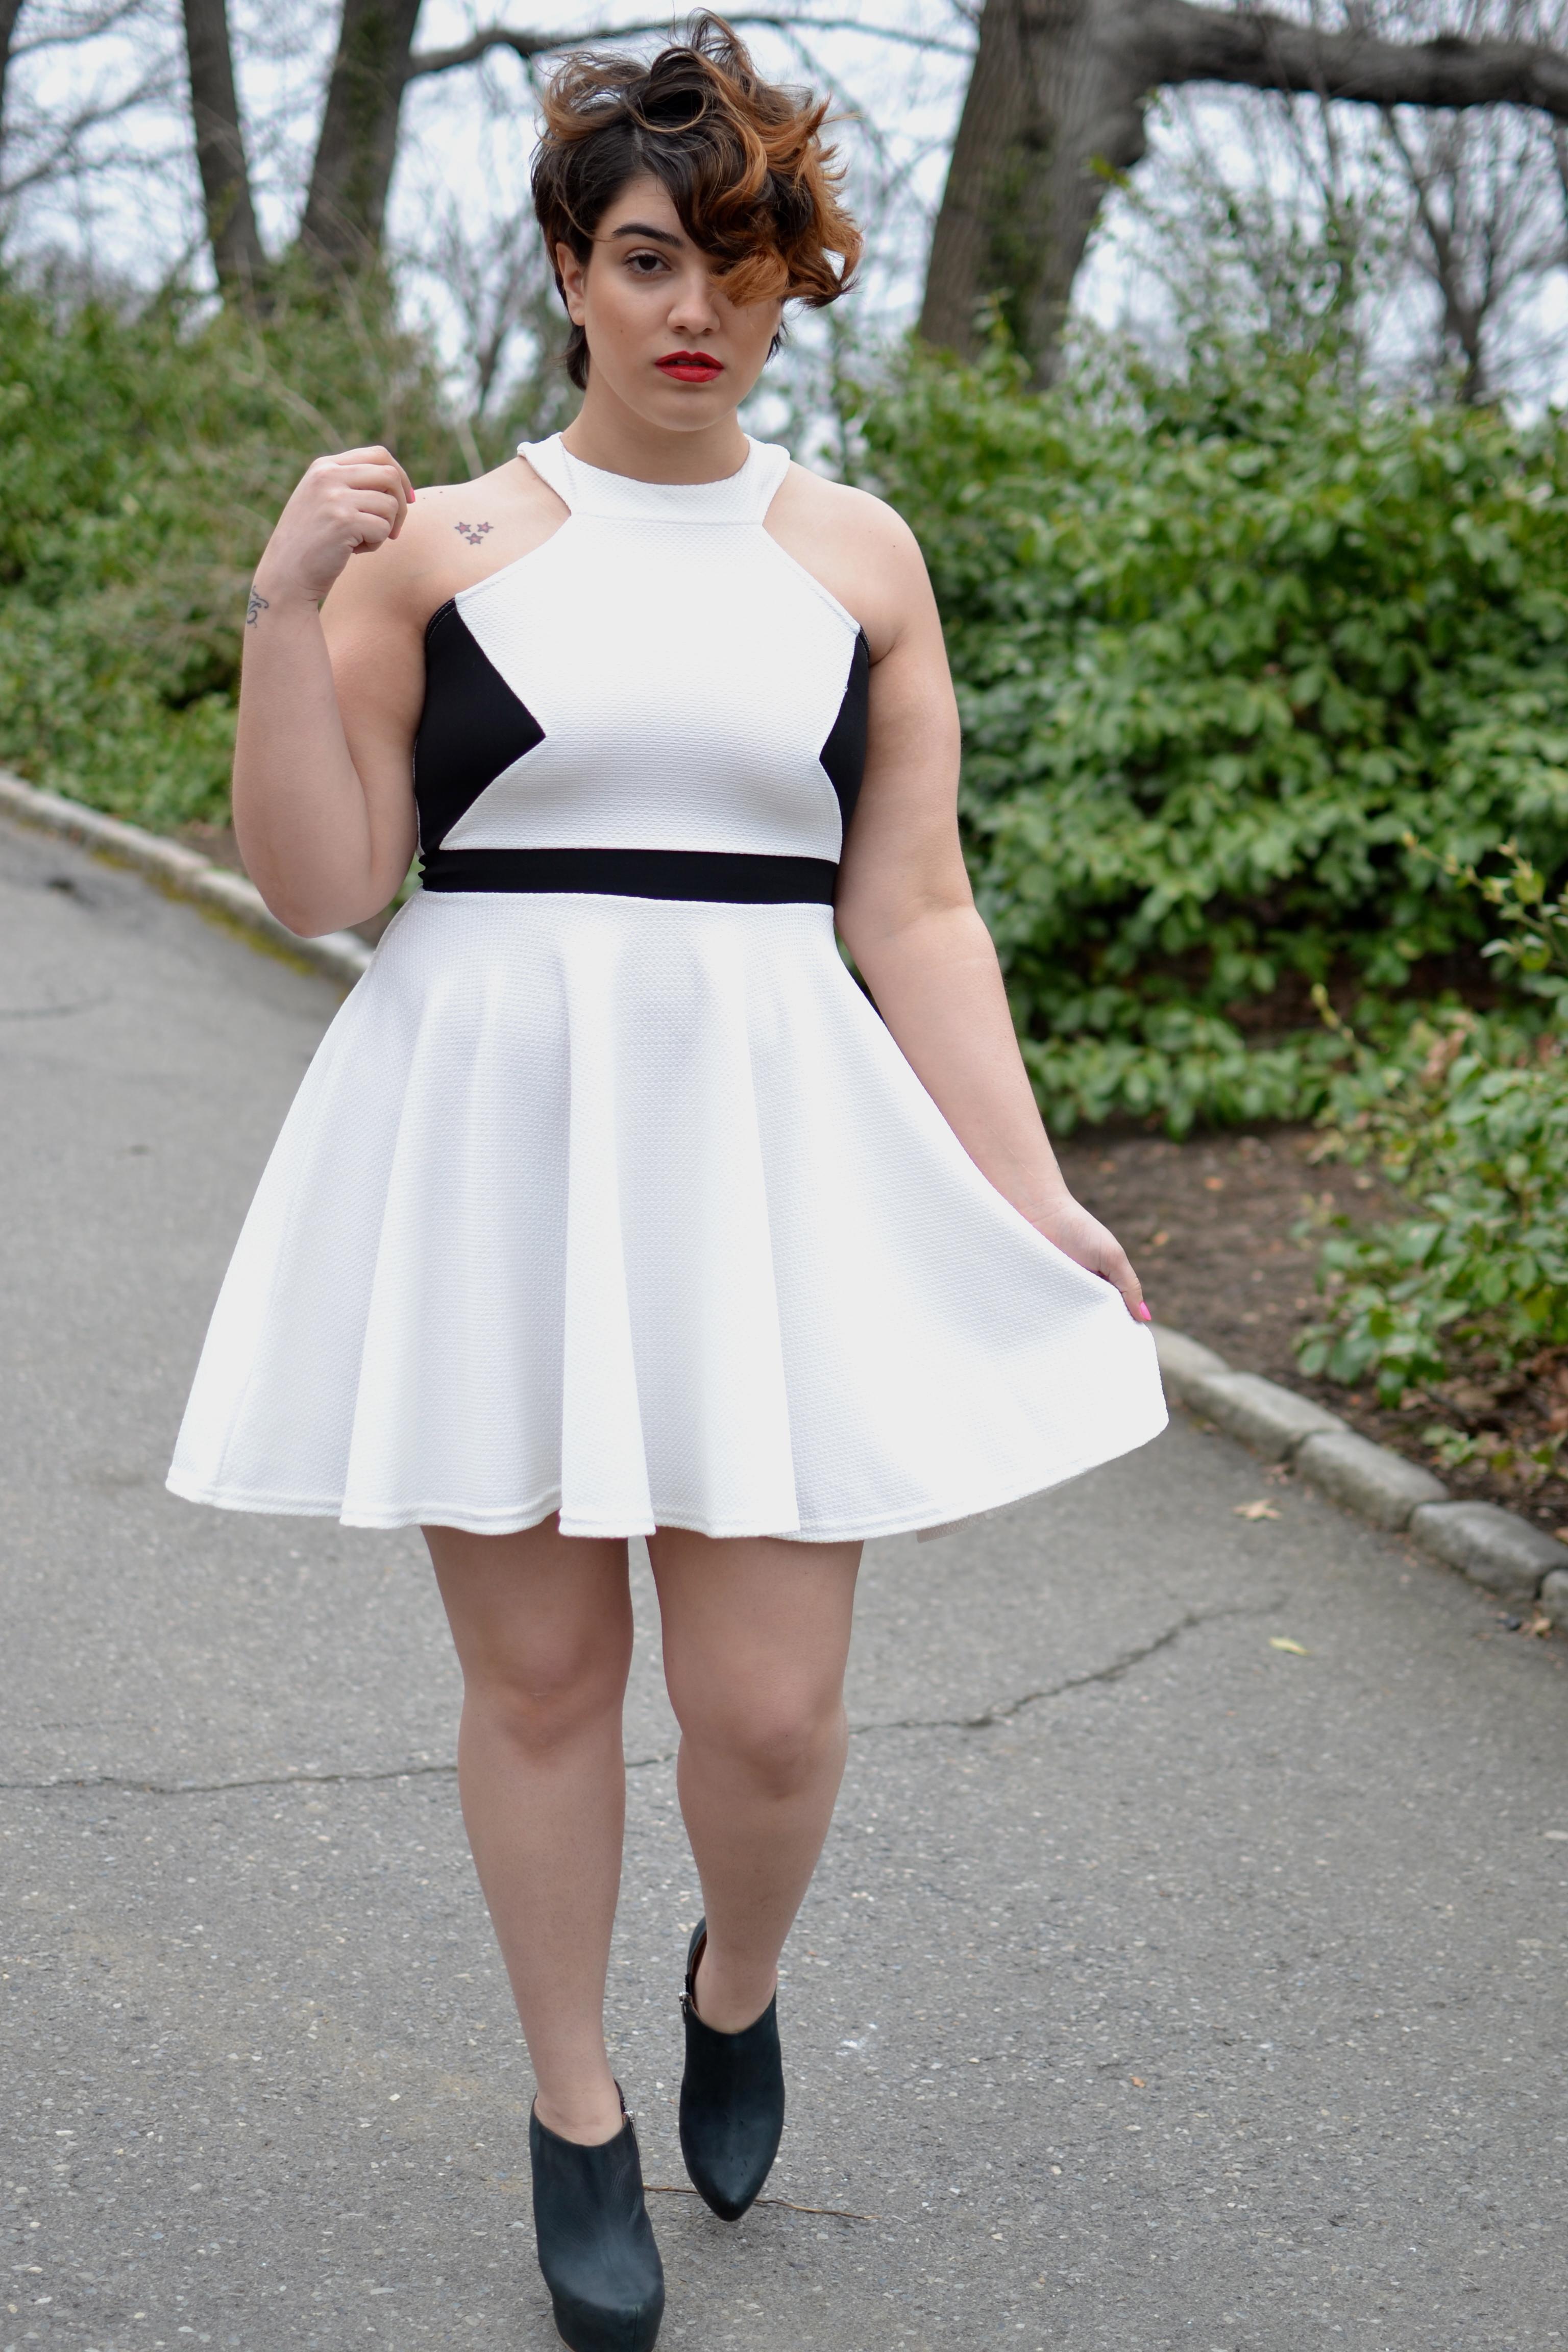 Plus Size Skater Dress | DressedUpGirl.com